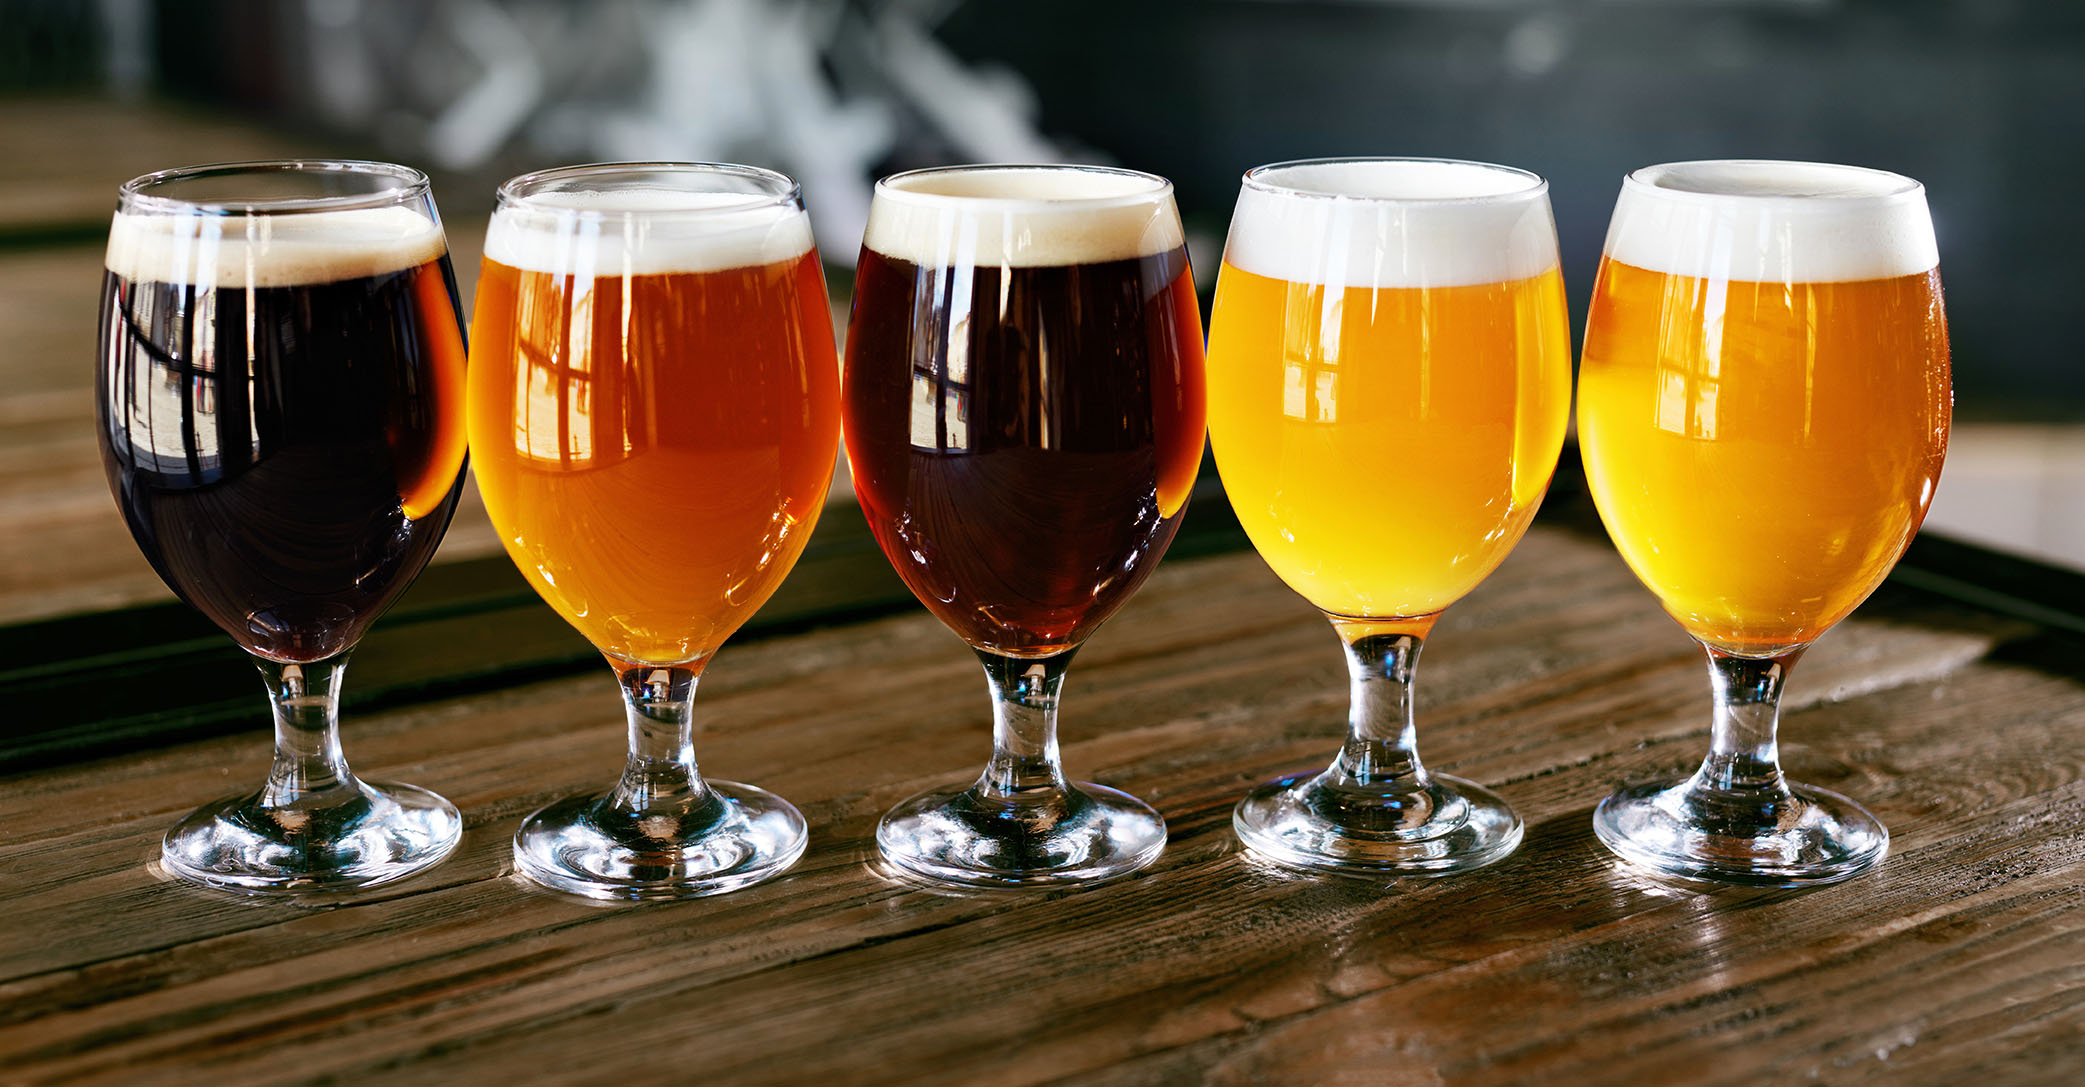 NH liquor liability